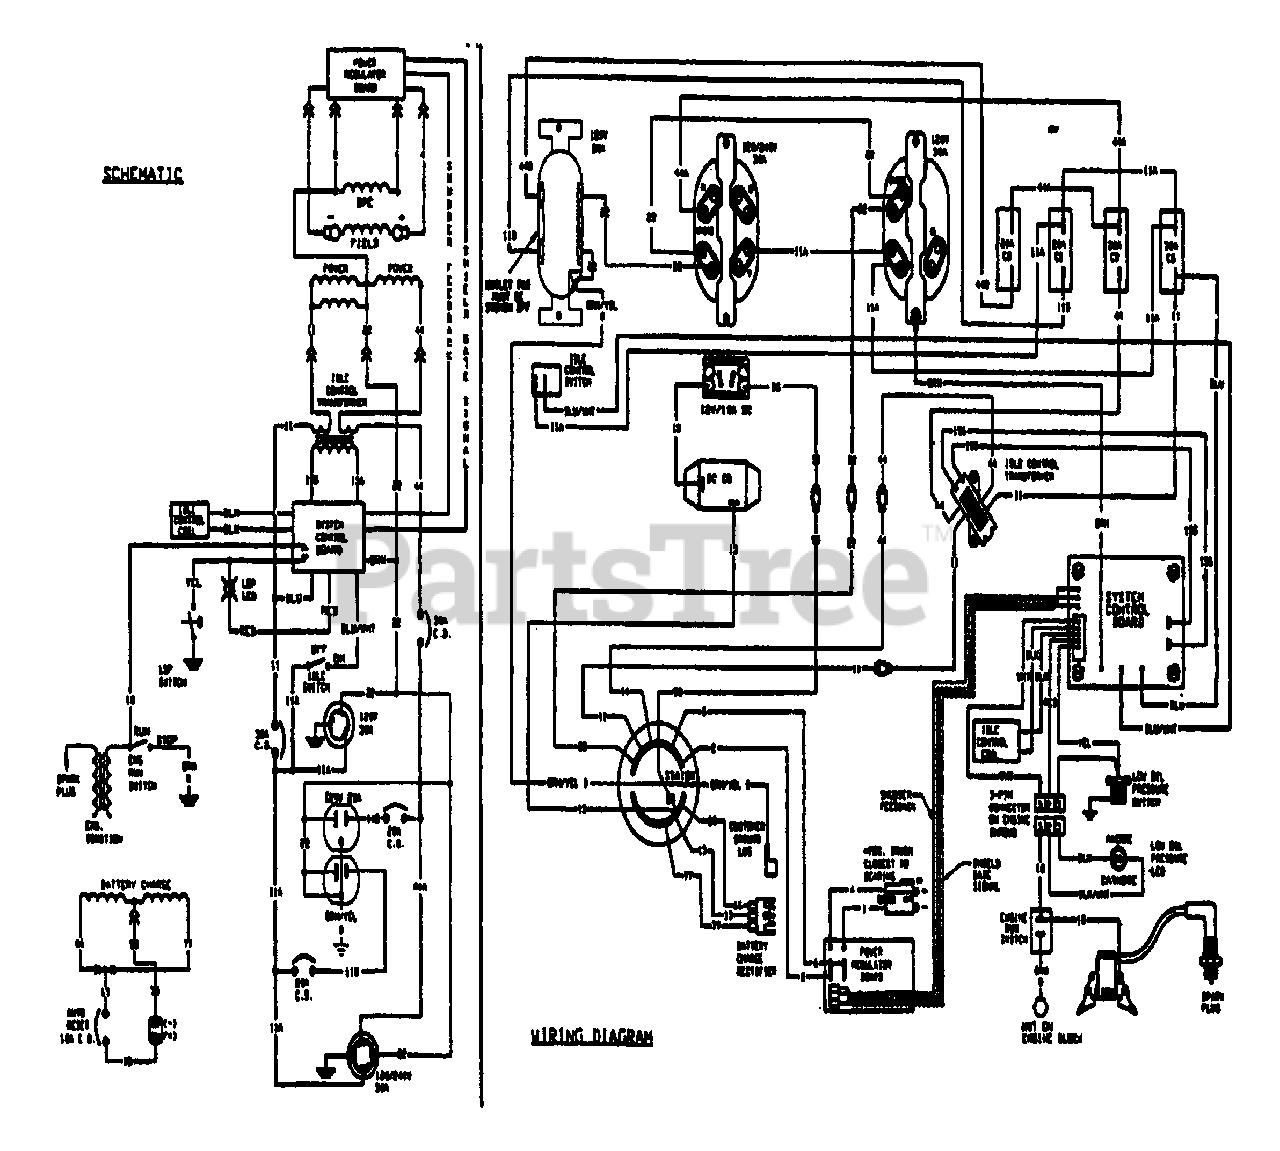 Diagram Generac Watt Generator Wiring Diagram Full